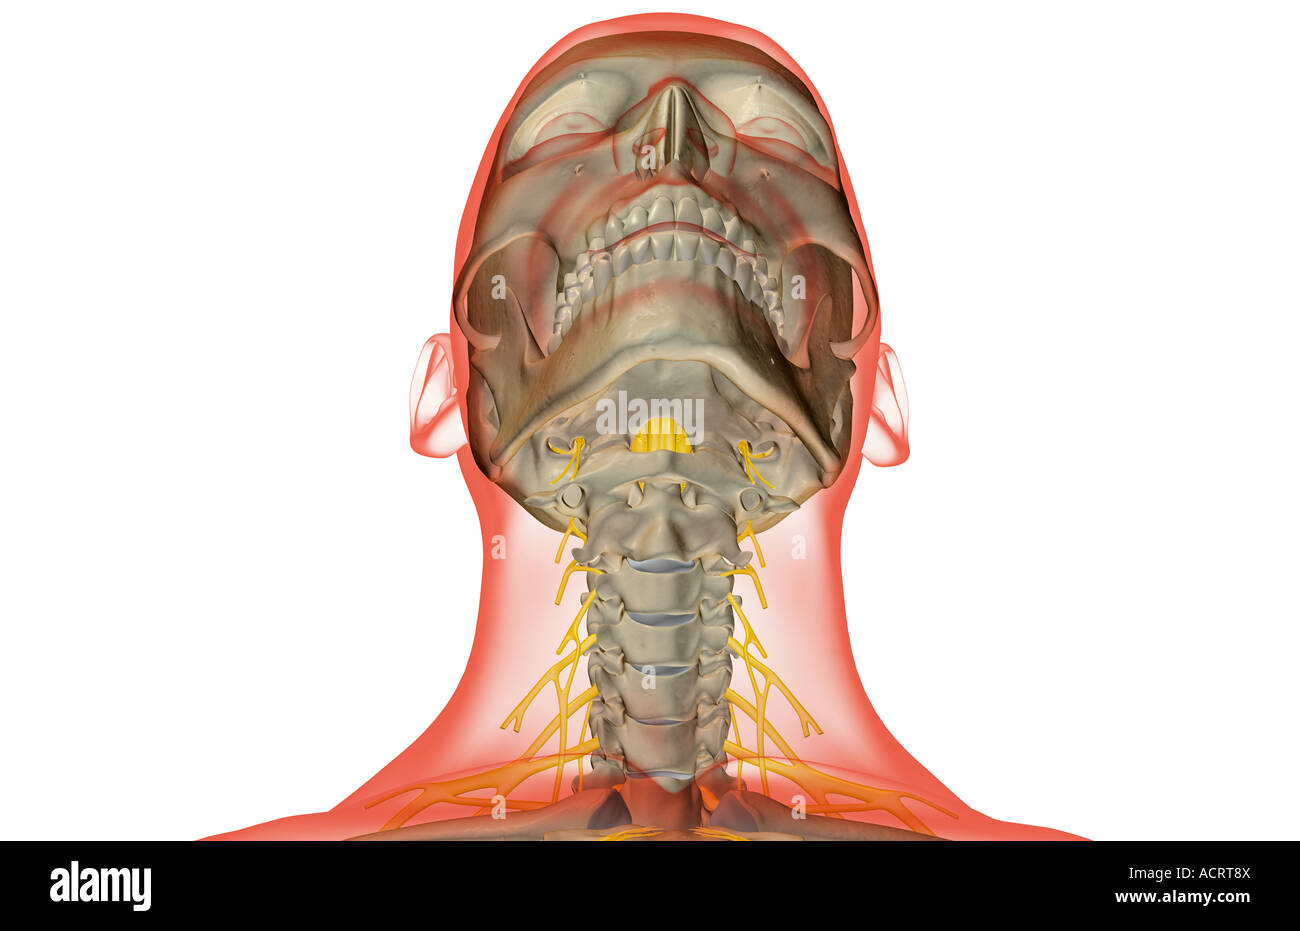 Die Nerven des Halses Stockfoto, Bild: 13220137 - Alamy